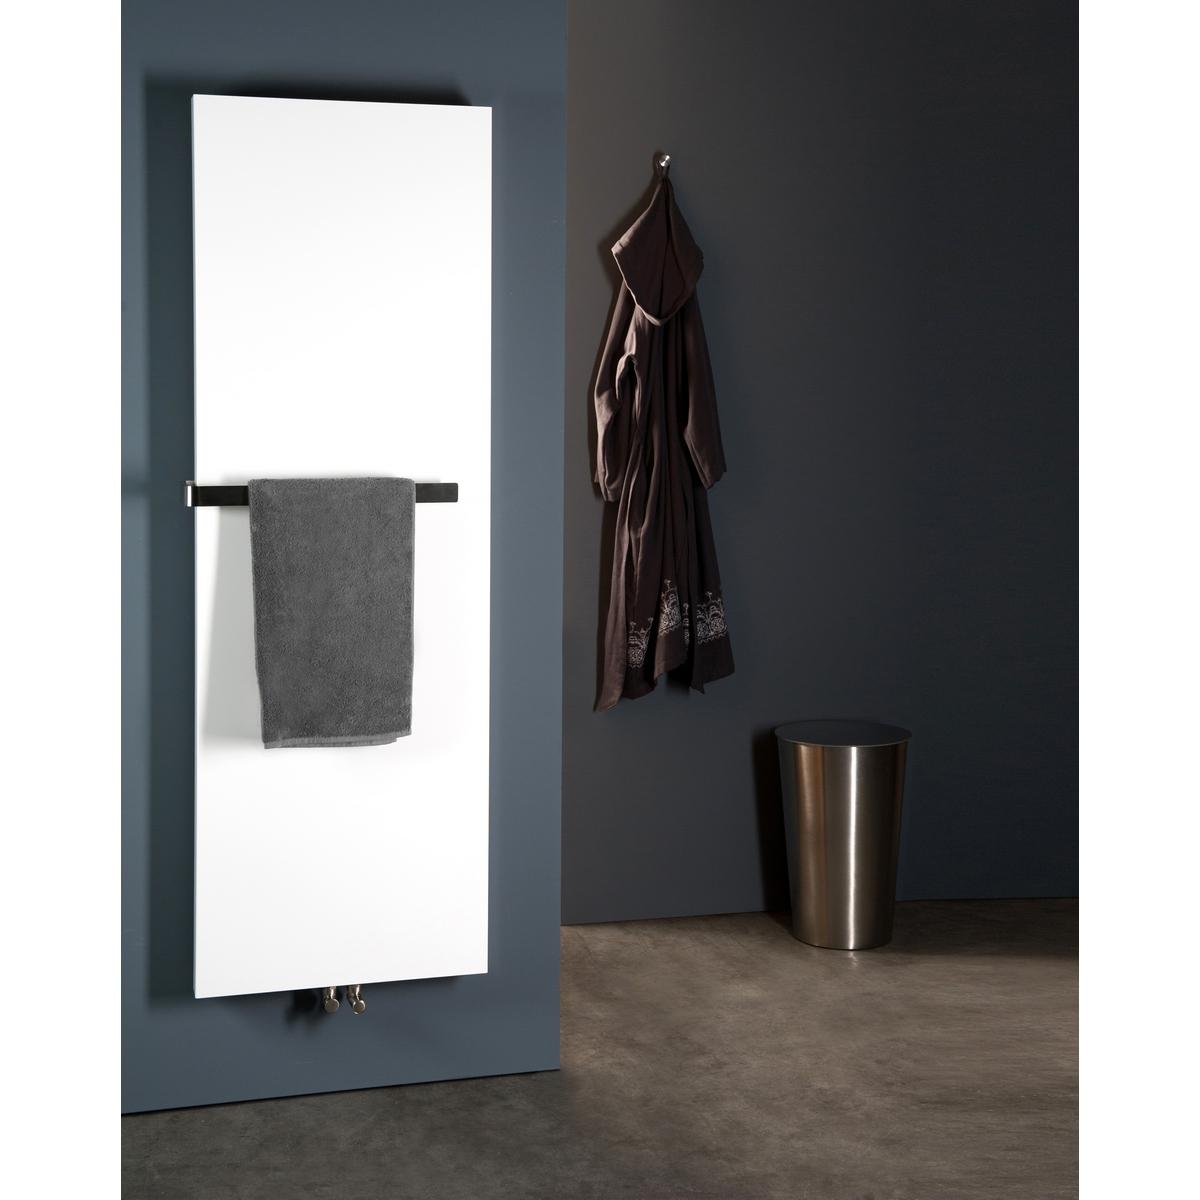 handdoekradiator badkamer